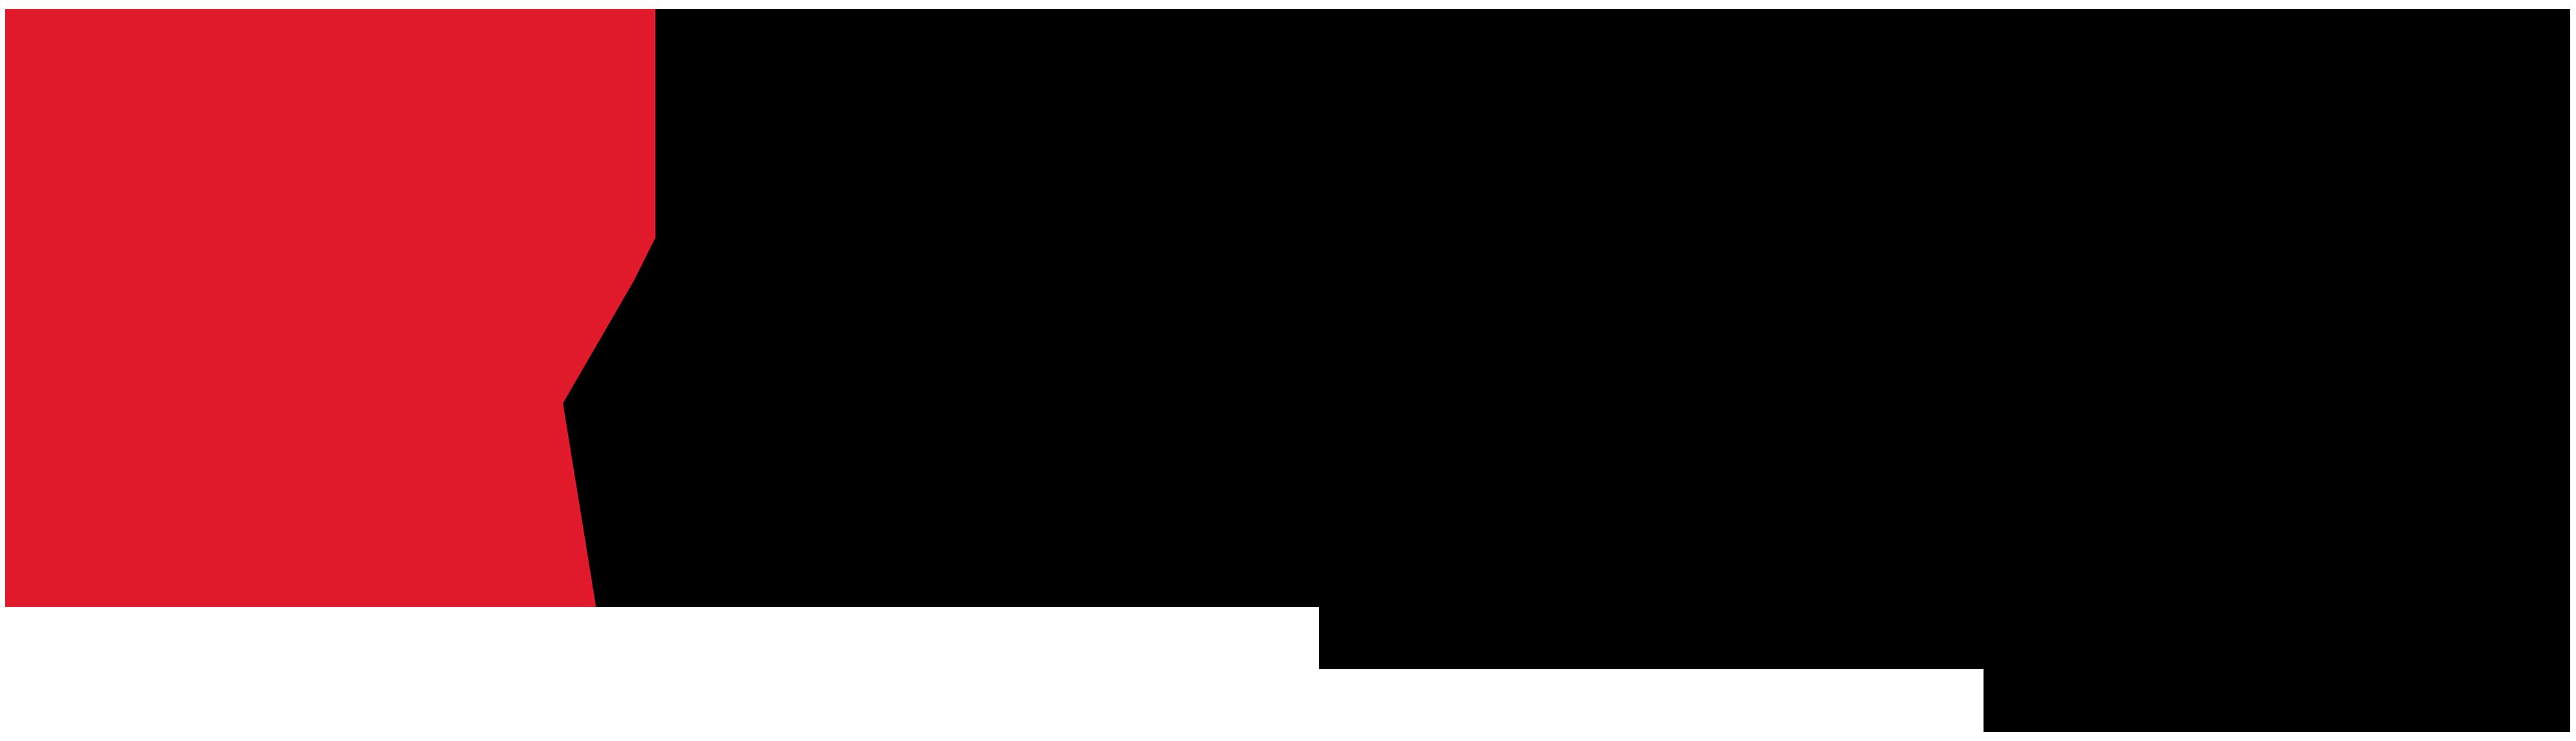 Macys_Standard